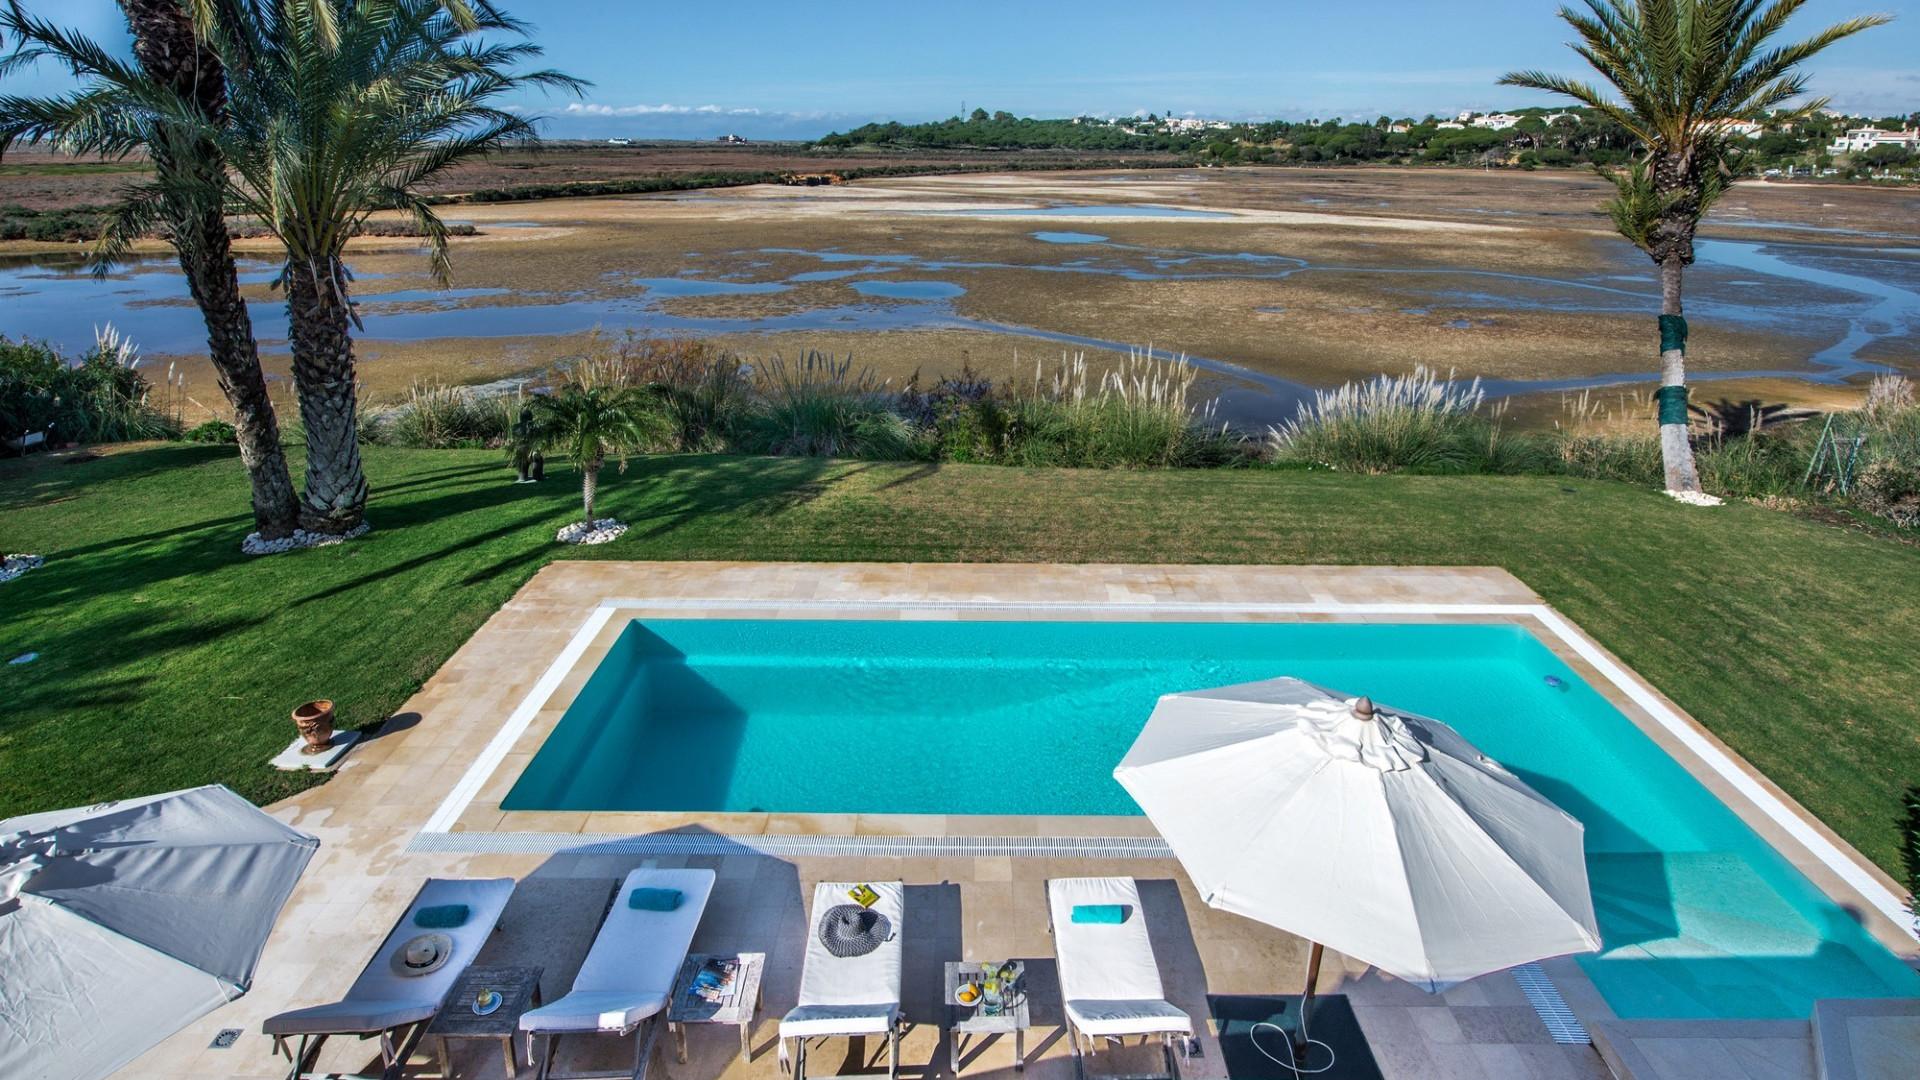 Luxury 4 Bedroom Villa Quinta do Lago Private Pool Close To The Beach